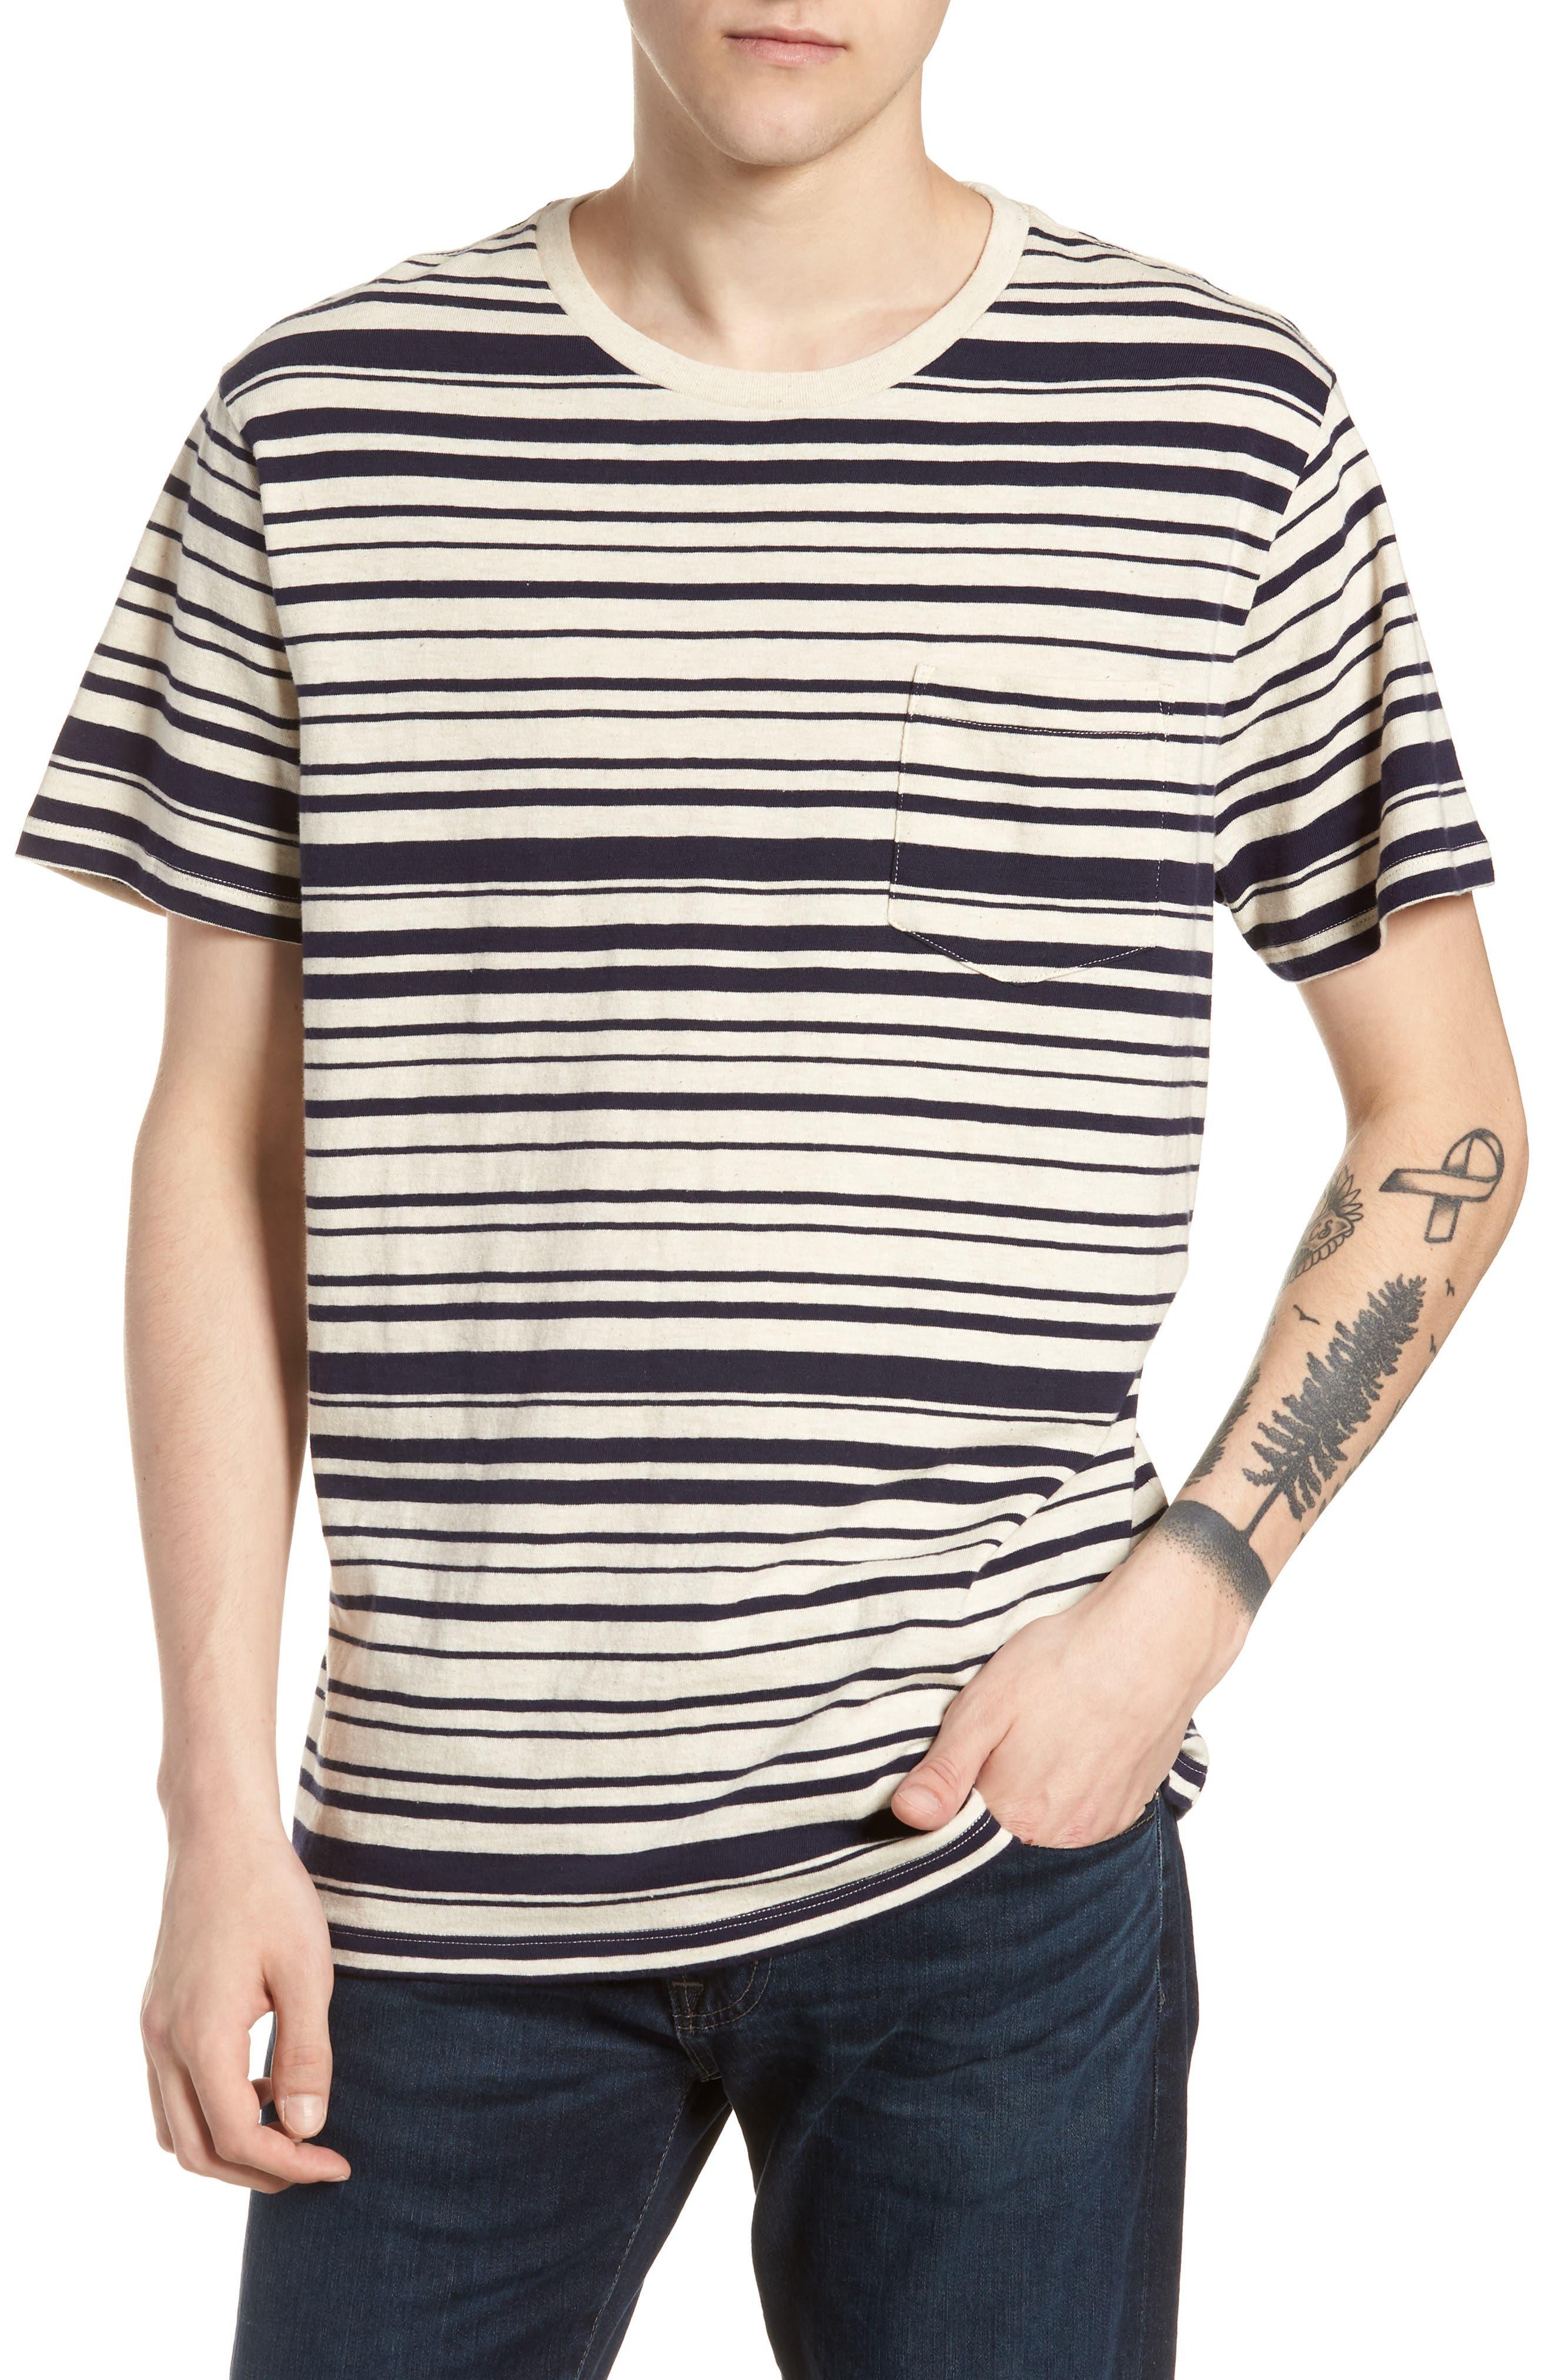 Variegated Stripe Slub Cotton T-Shirt,                             Main thumbnail 1, color,                             Ivory Navy